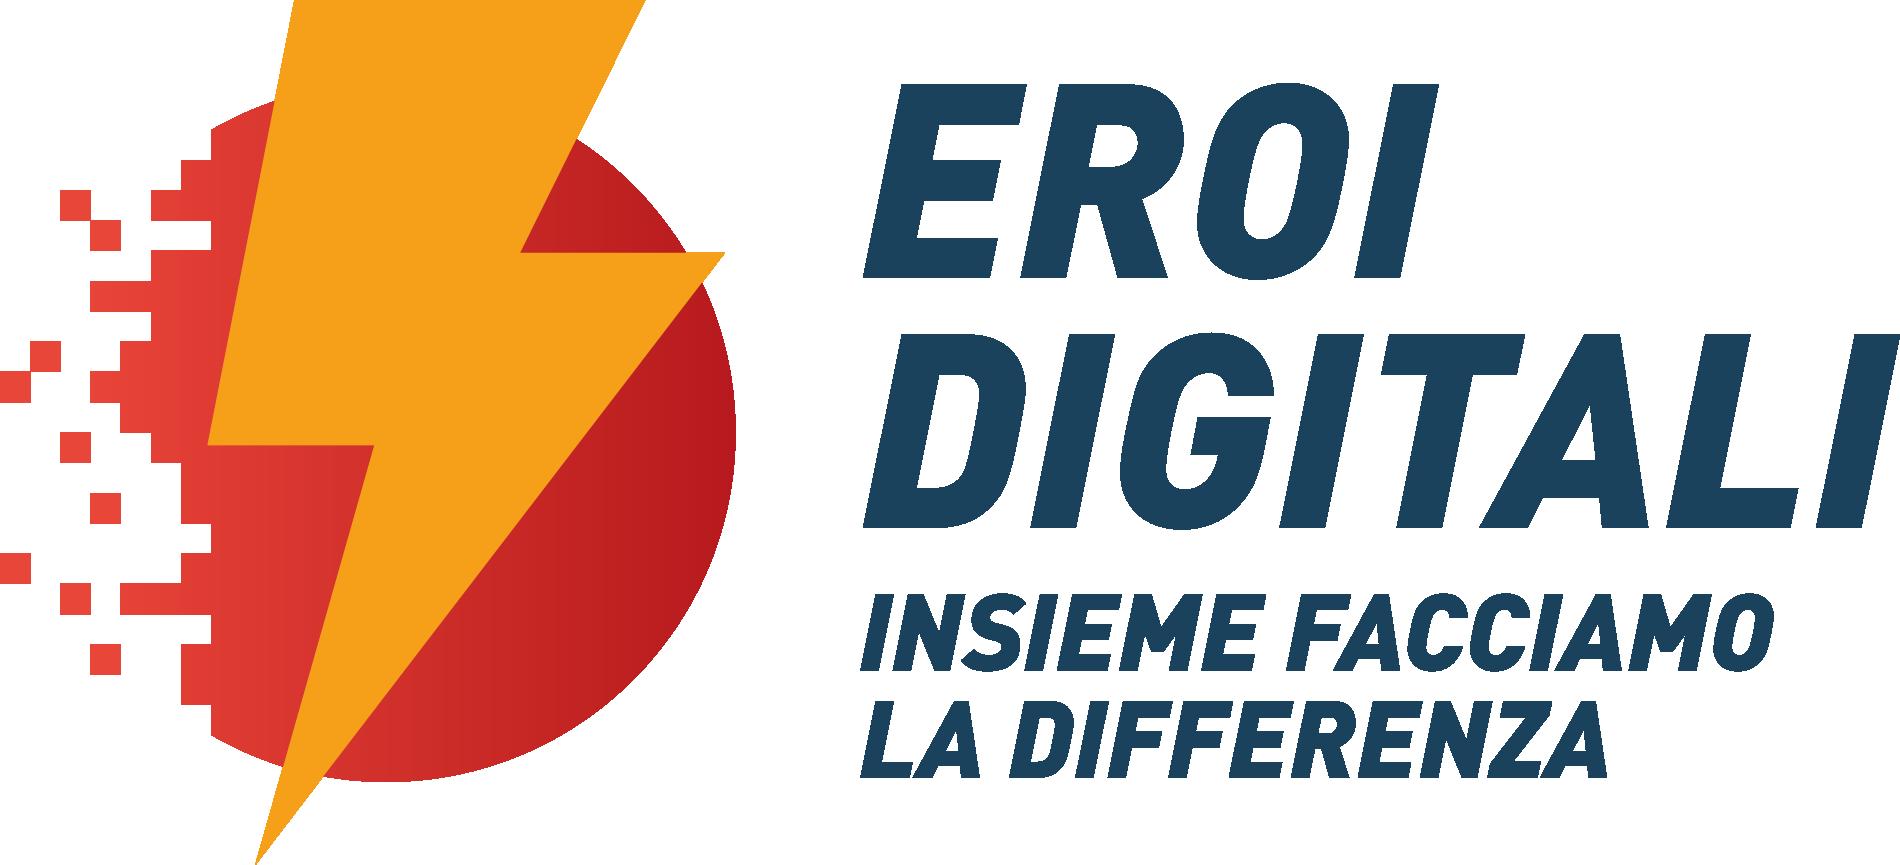 Eroi Digitali 4